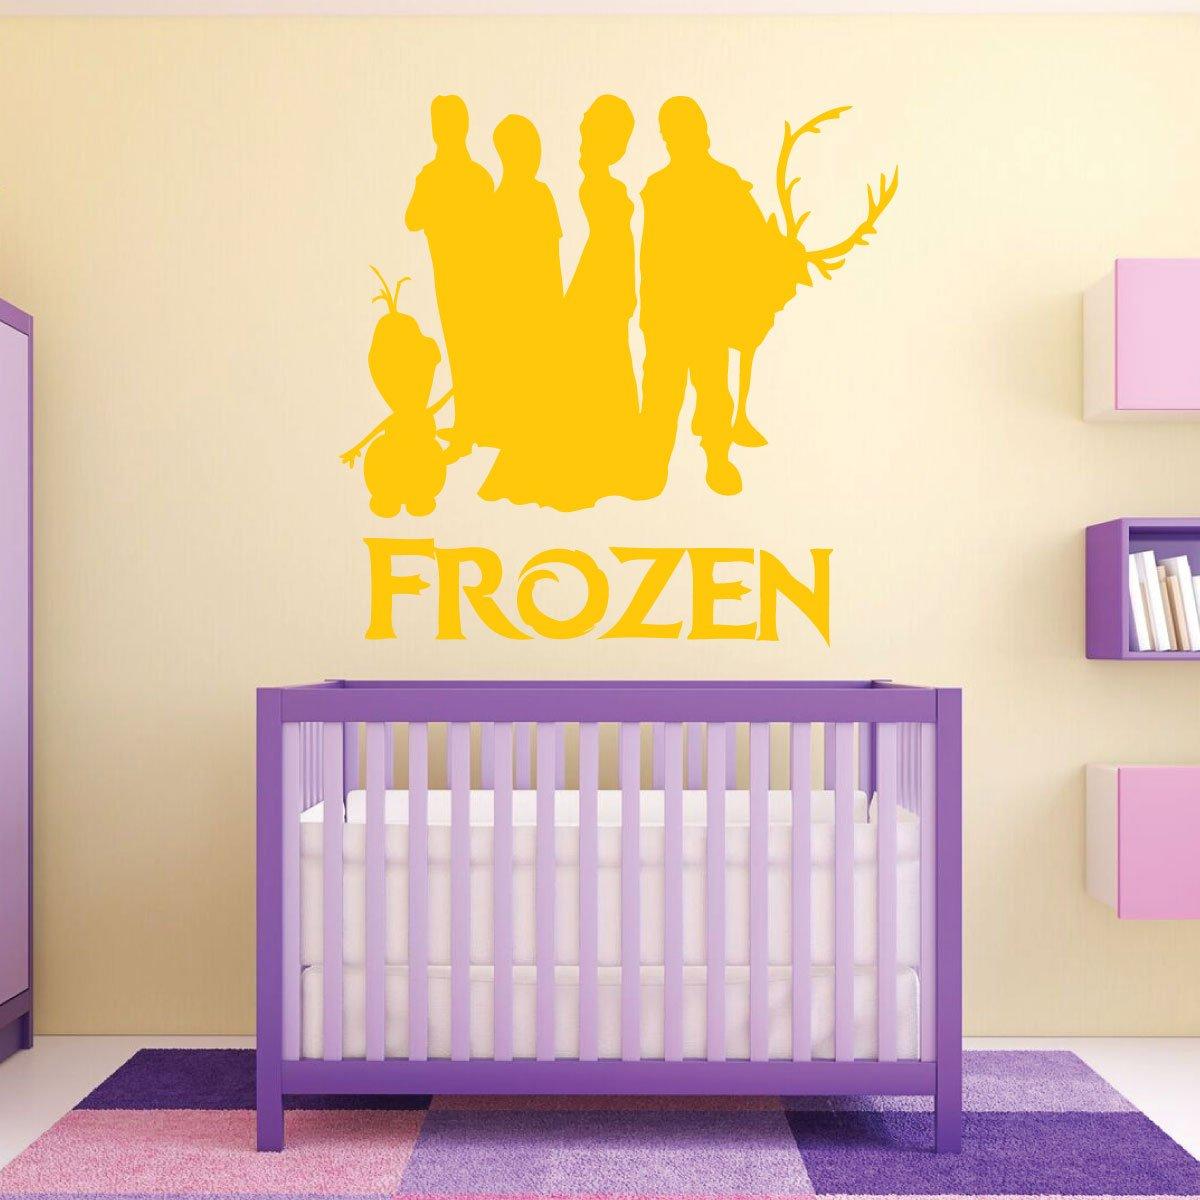 Amazon.com: Frozen Wall Decor Vinyl Wall Art Playroom Ideas, Baby ...